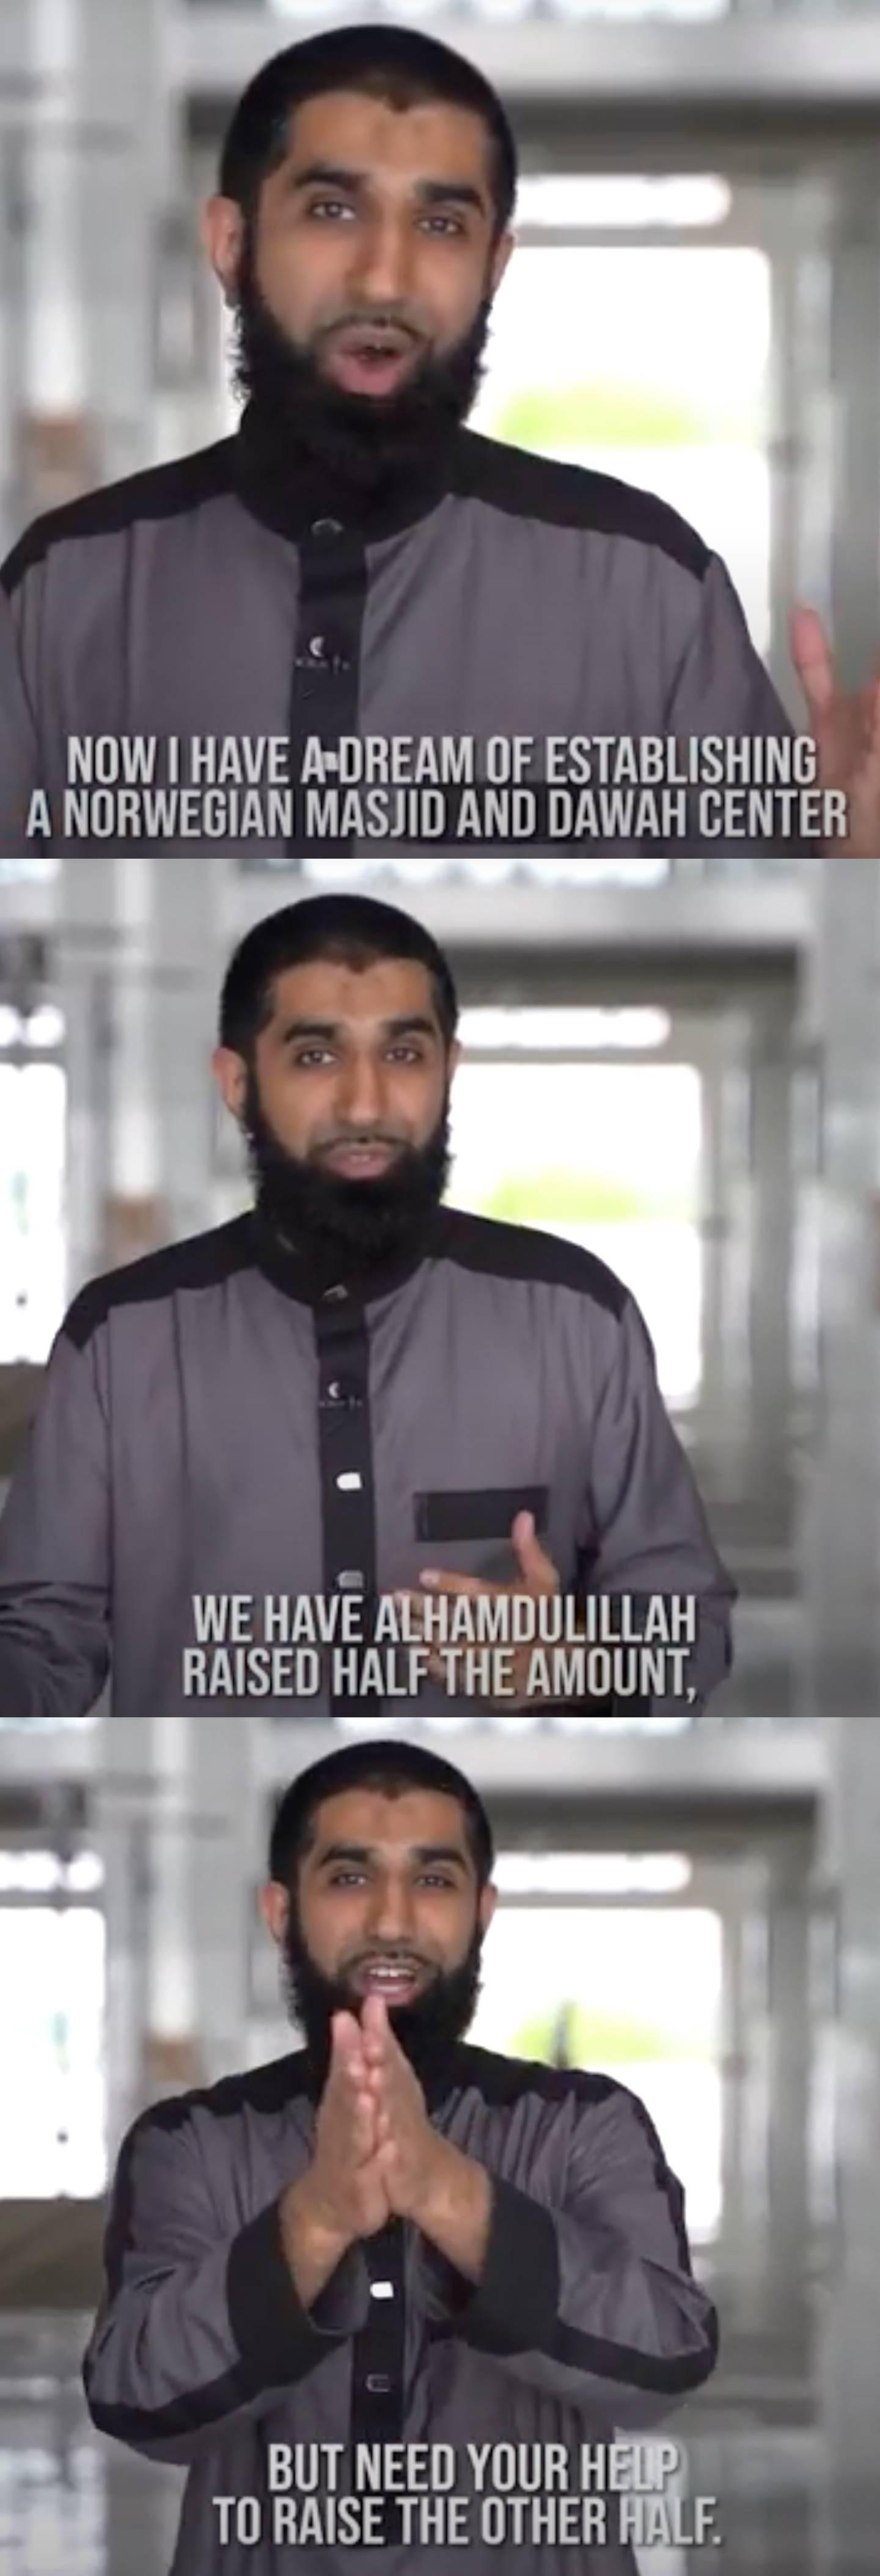 FRONTET: Fahad Qureshi har frontet innsamling til det som overfor givere er markedsført som en moské og forkynnelsessenter i Norge.